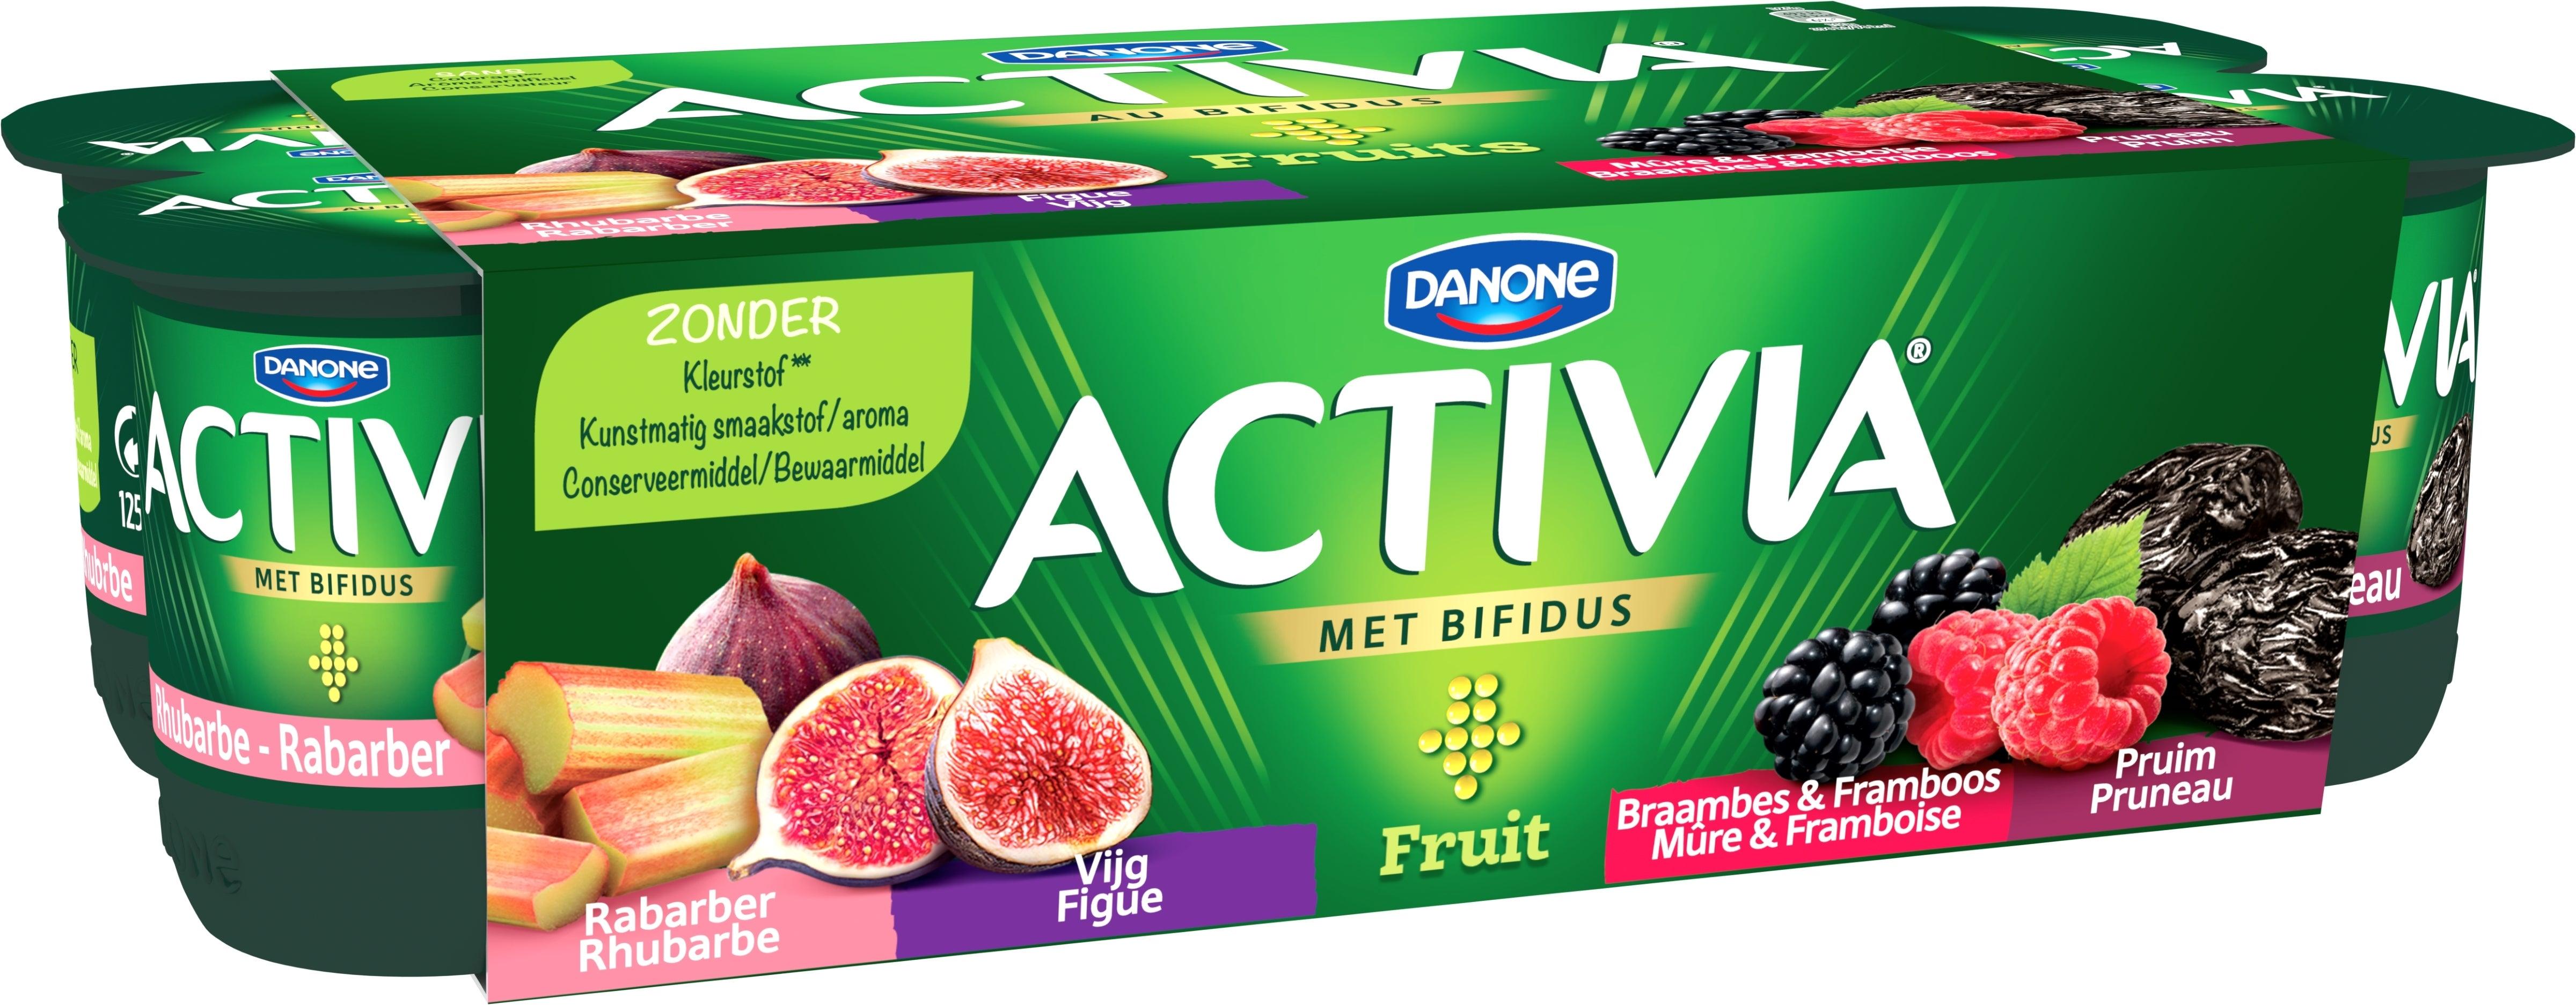 Activia Fruit - Rhubarbe Figue Mûre & Framboise Pruneau